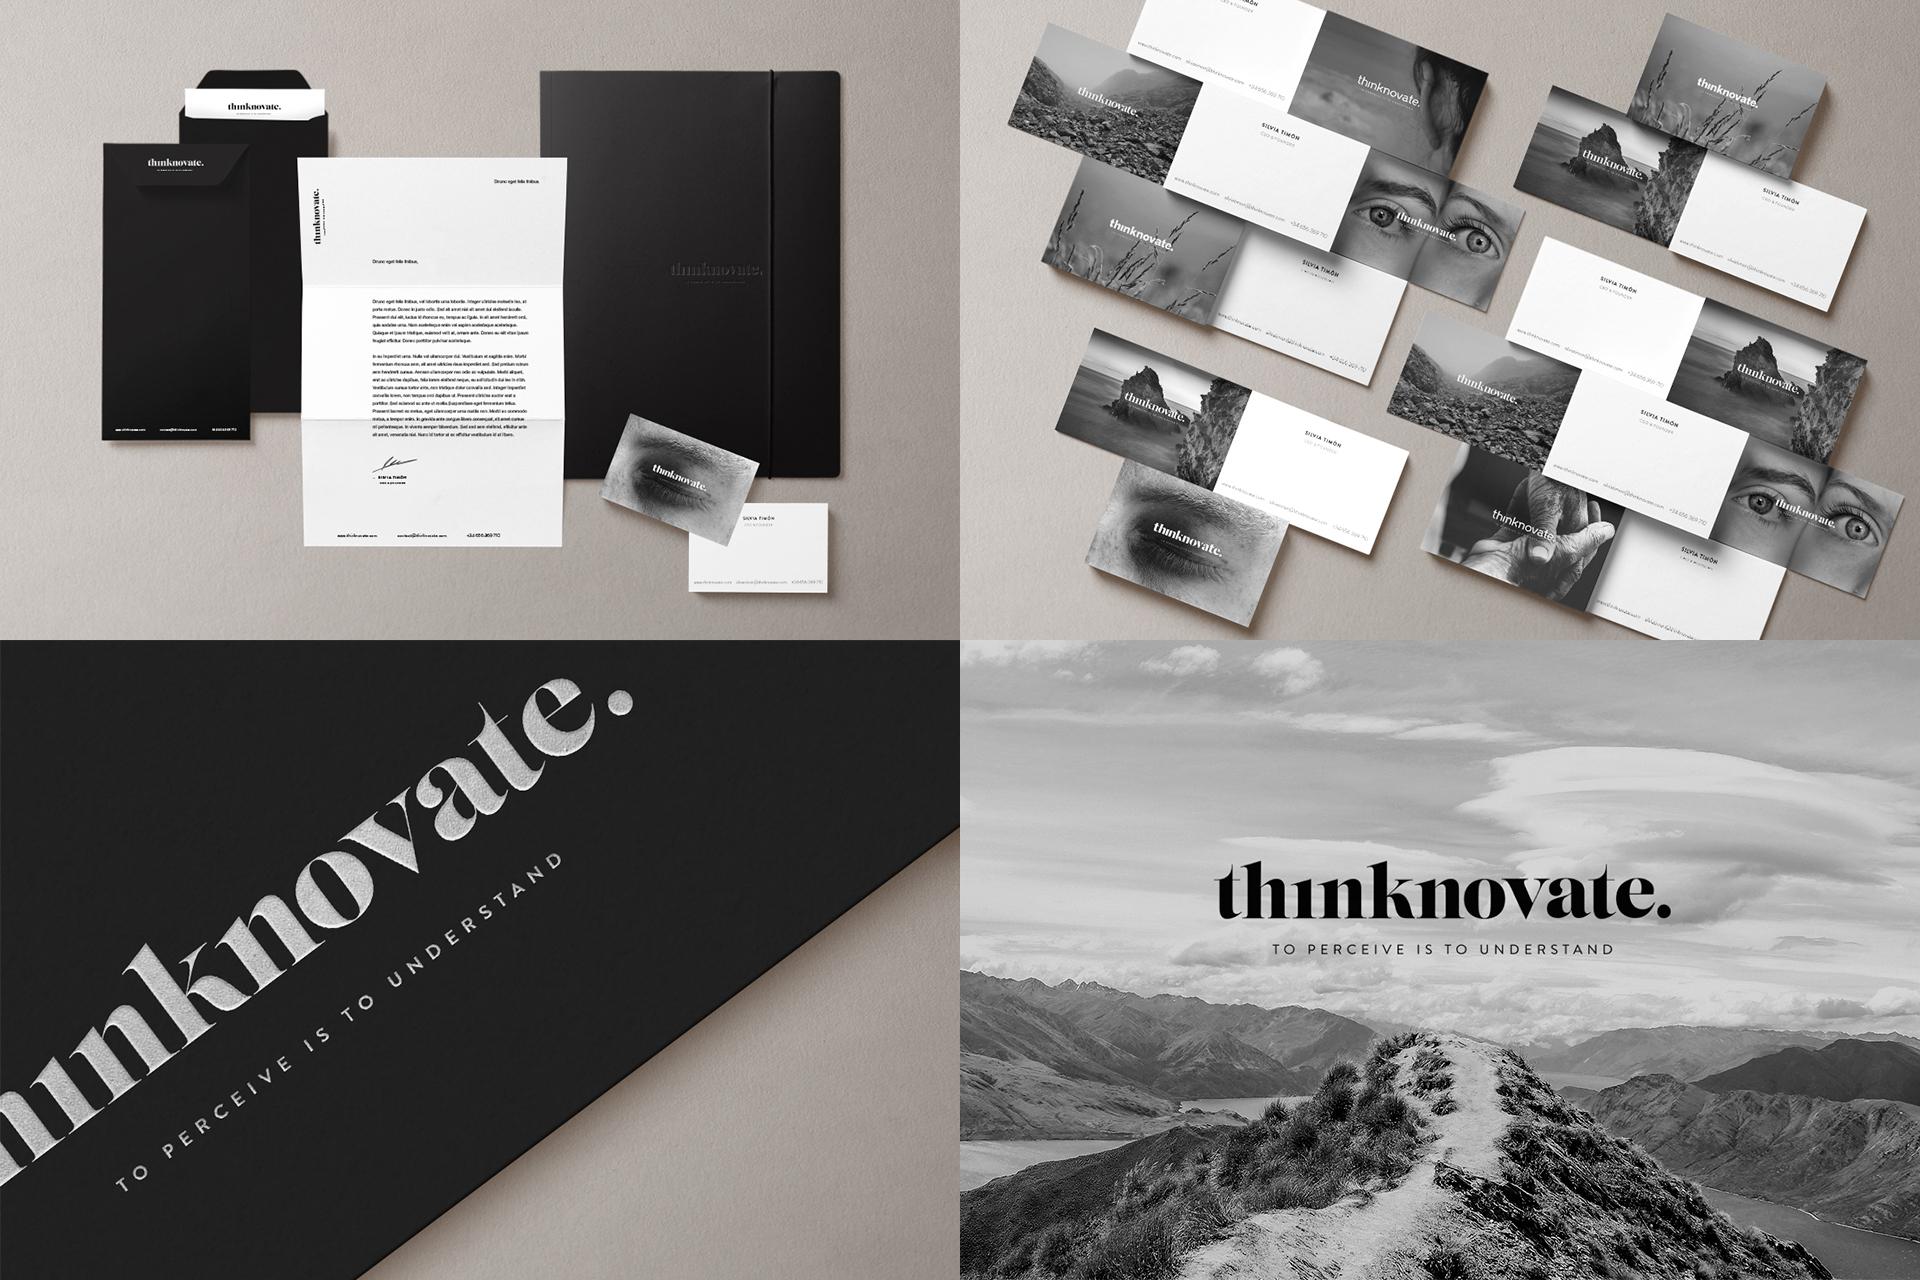 Thinknovate, Estrategia, Storytelling & Branding by Silenceworks - Creative Work - $i